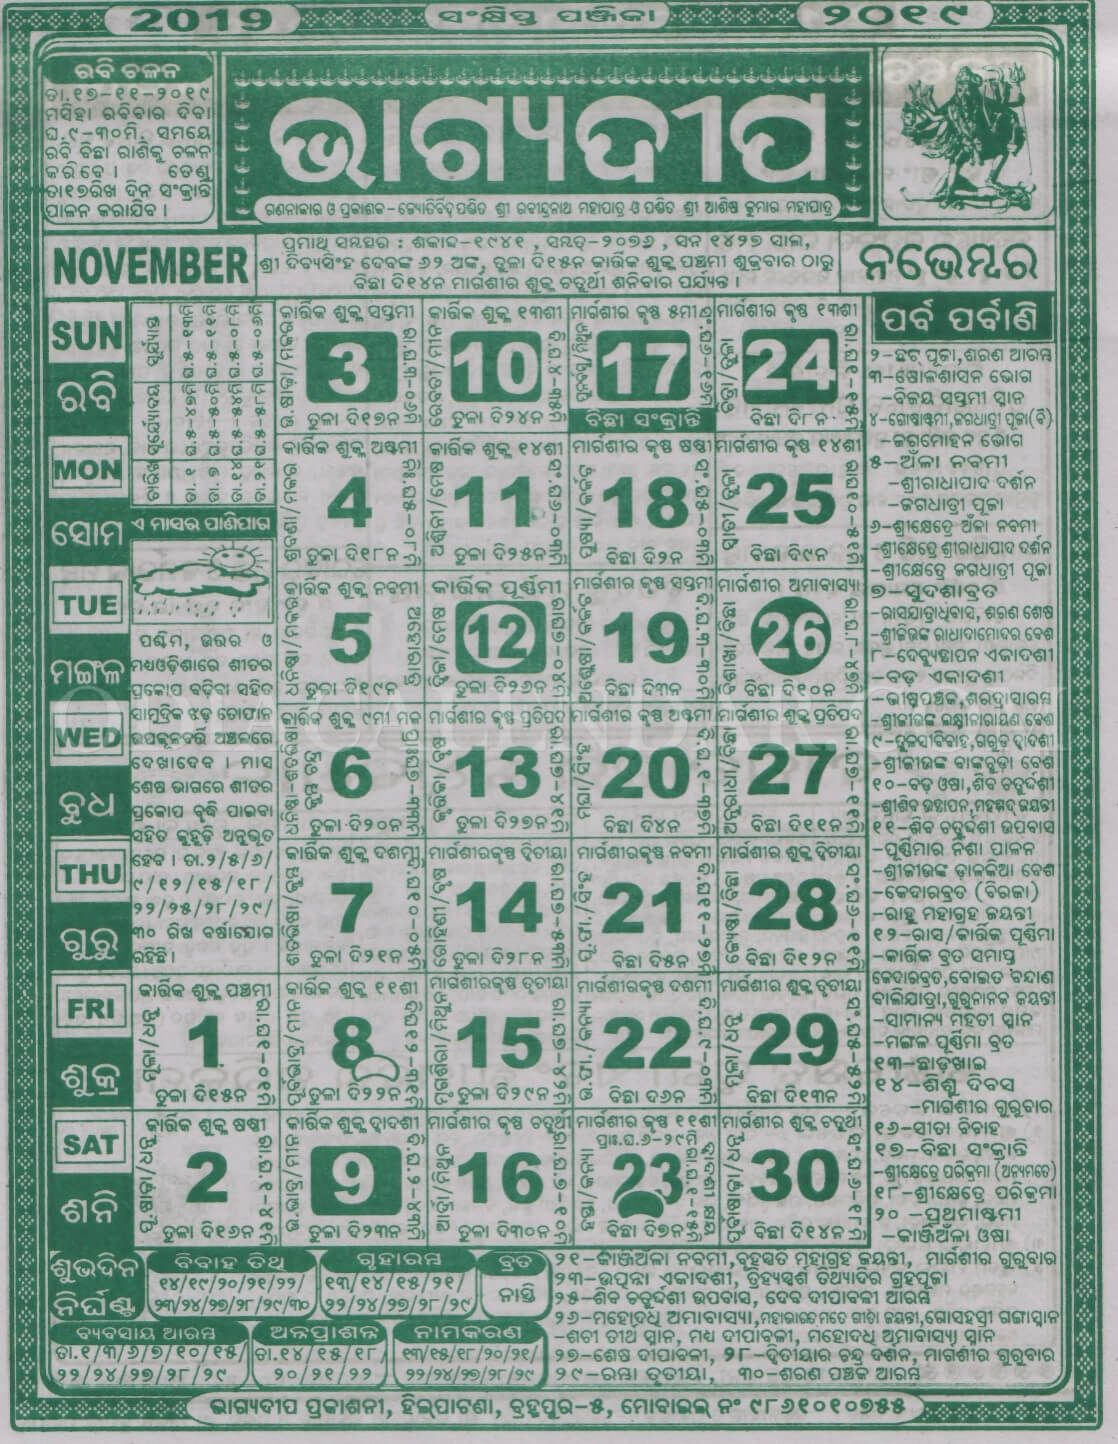 Bhagyadeep Calendar November 2019 | Calendar, High Quality inside Bhagyadipa Odia Calendar 2020